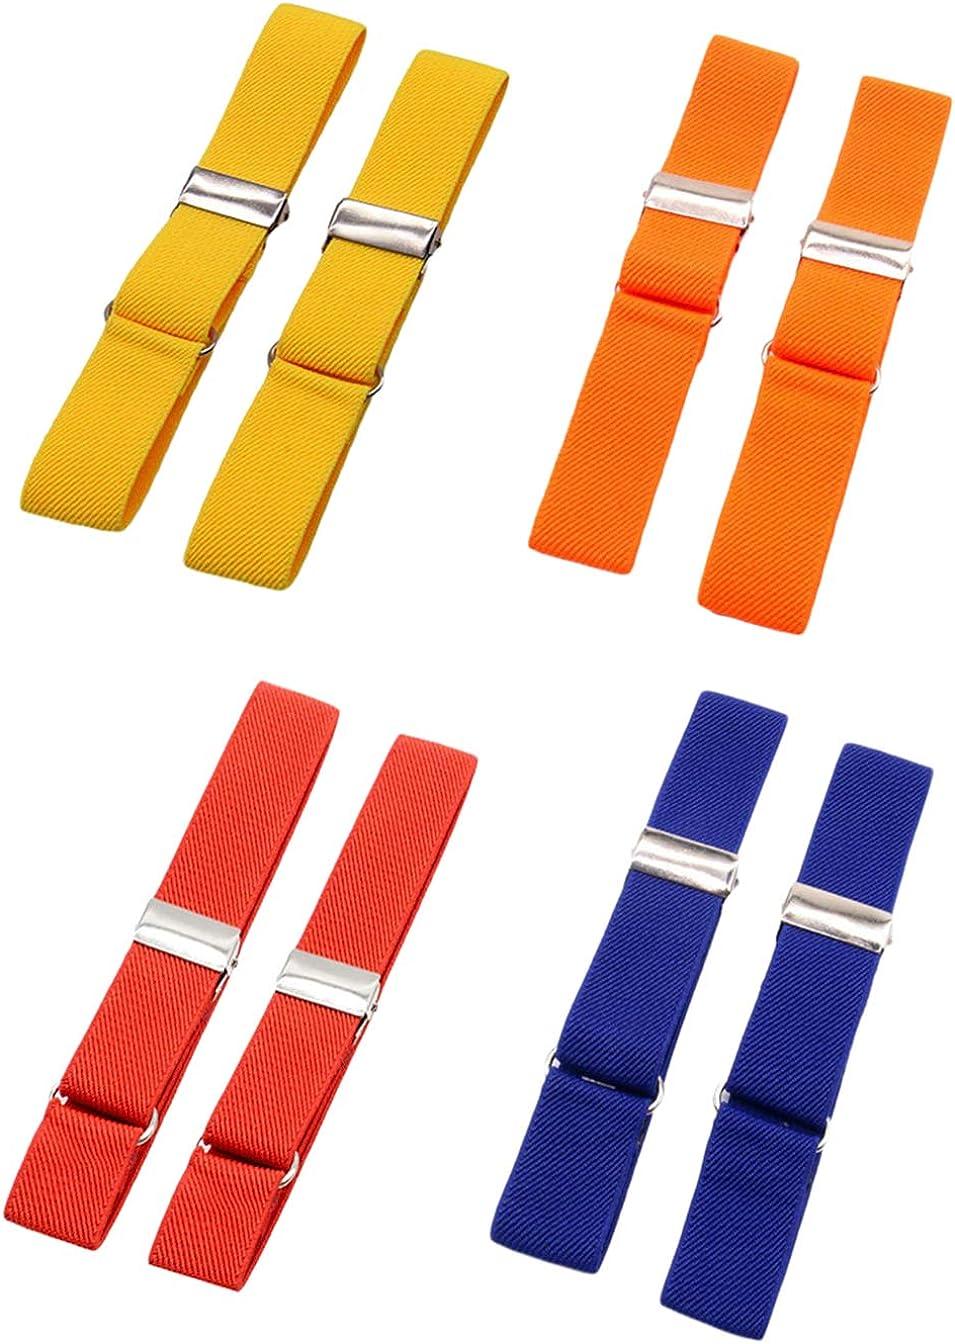 SupSuspen 4 Pairs Shirt Garters Armbands for Men Elastic Sleeve Holders 1